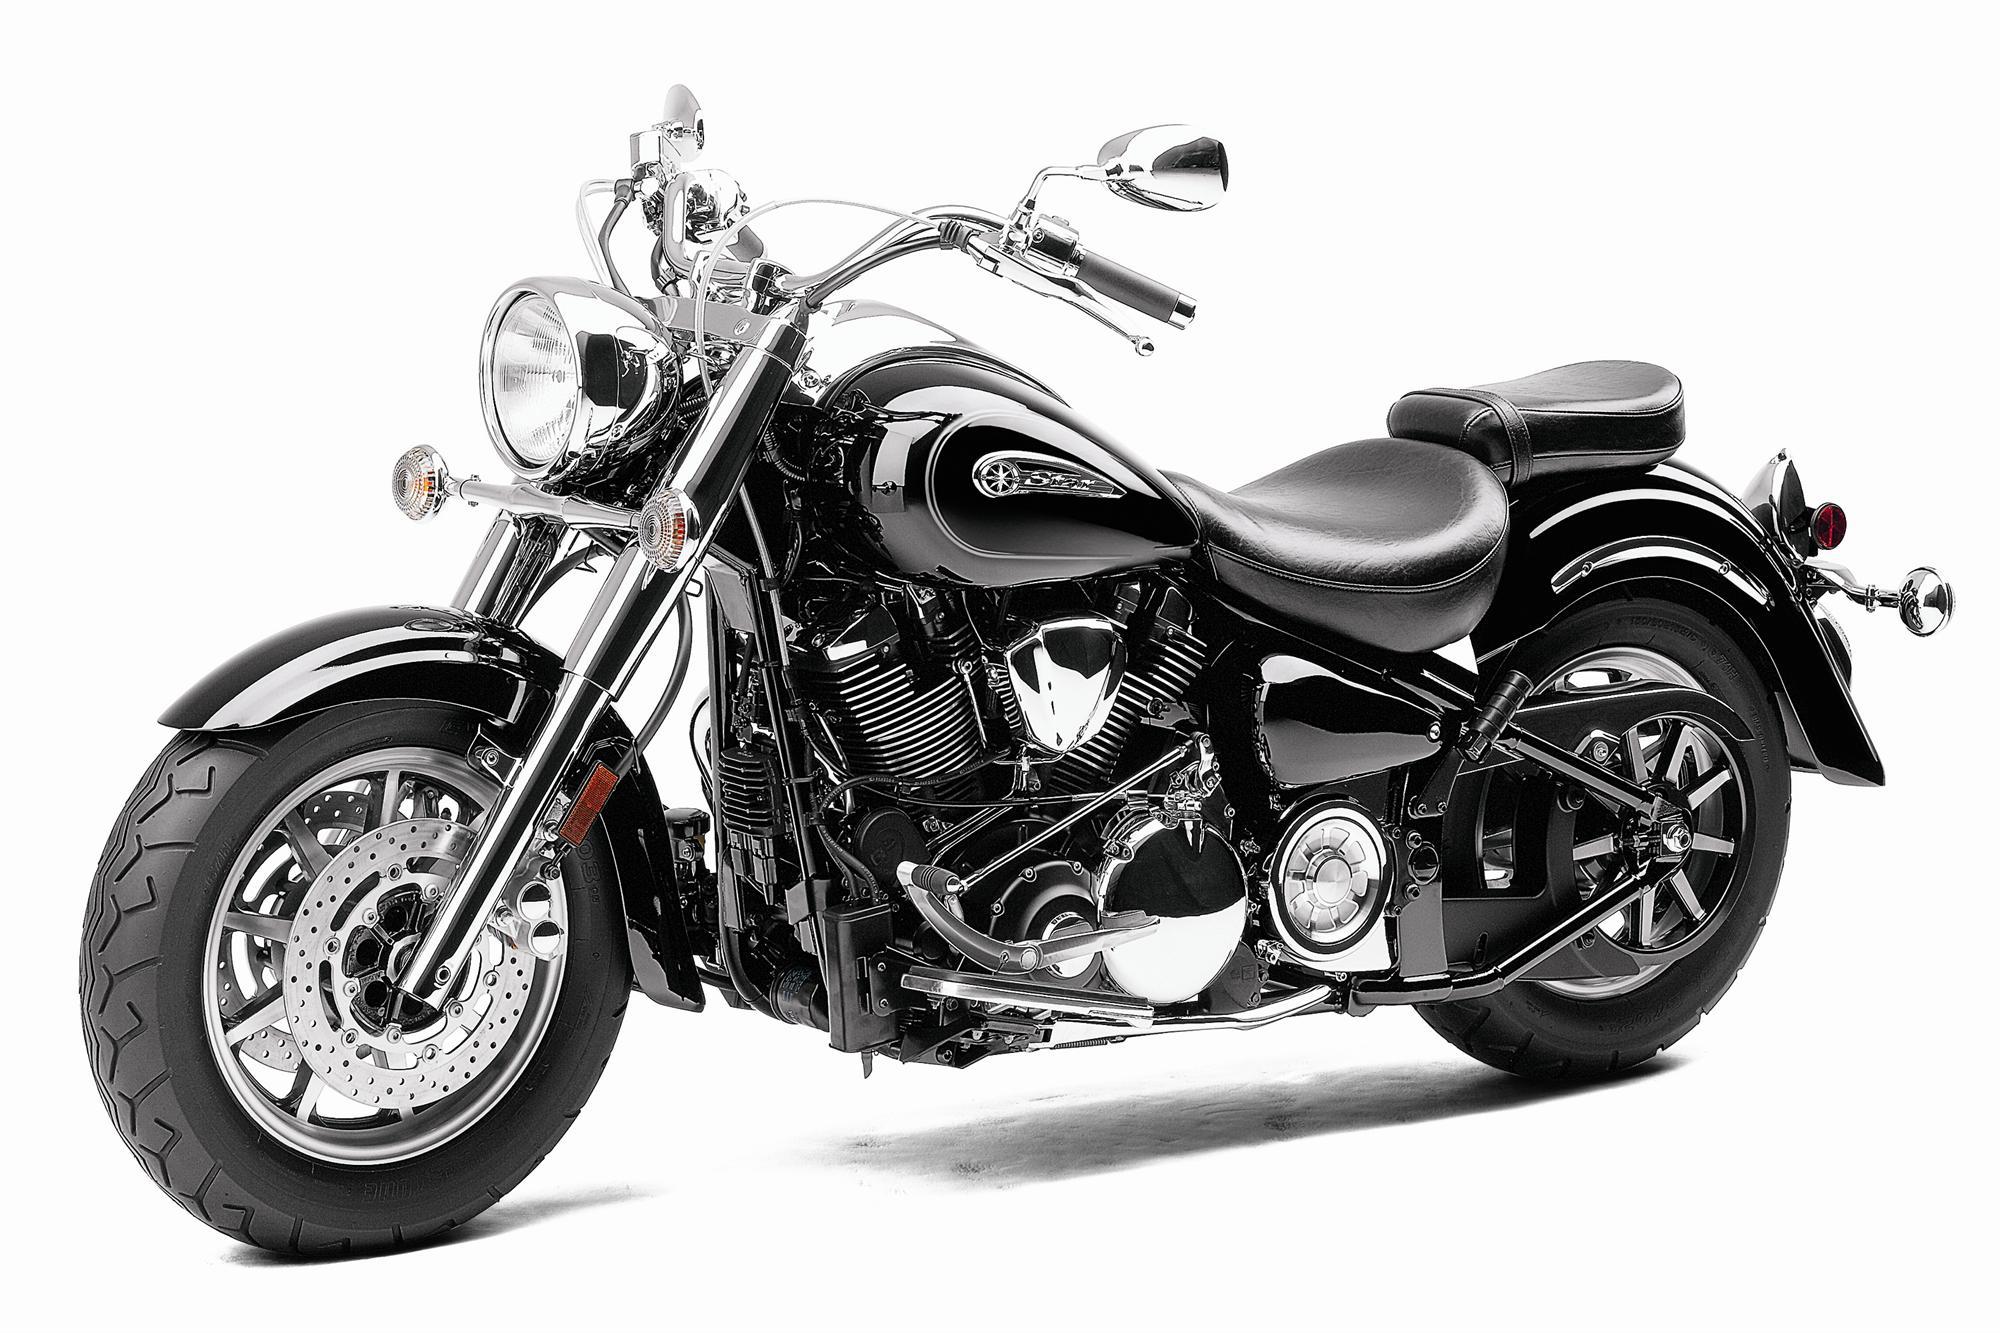 Мотоцикл yamaha road star s 1700 2012